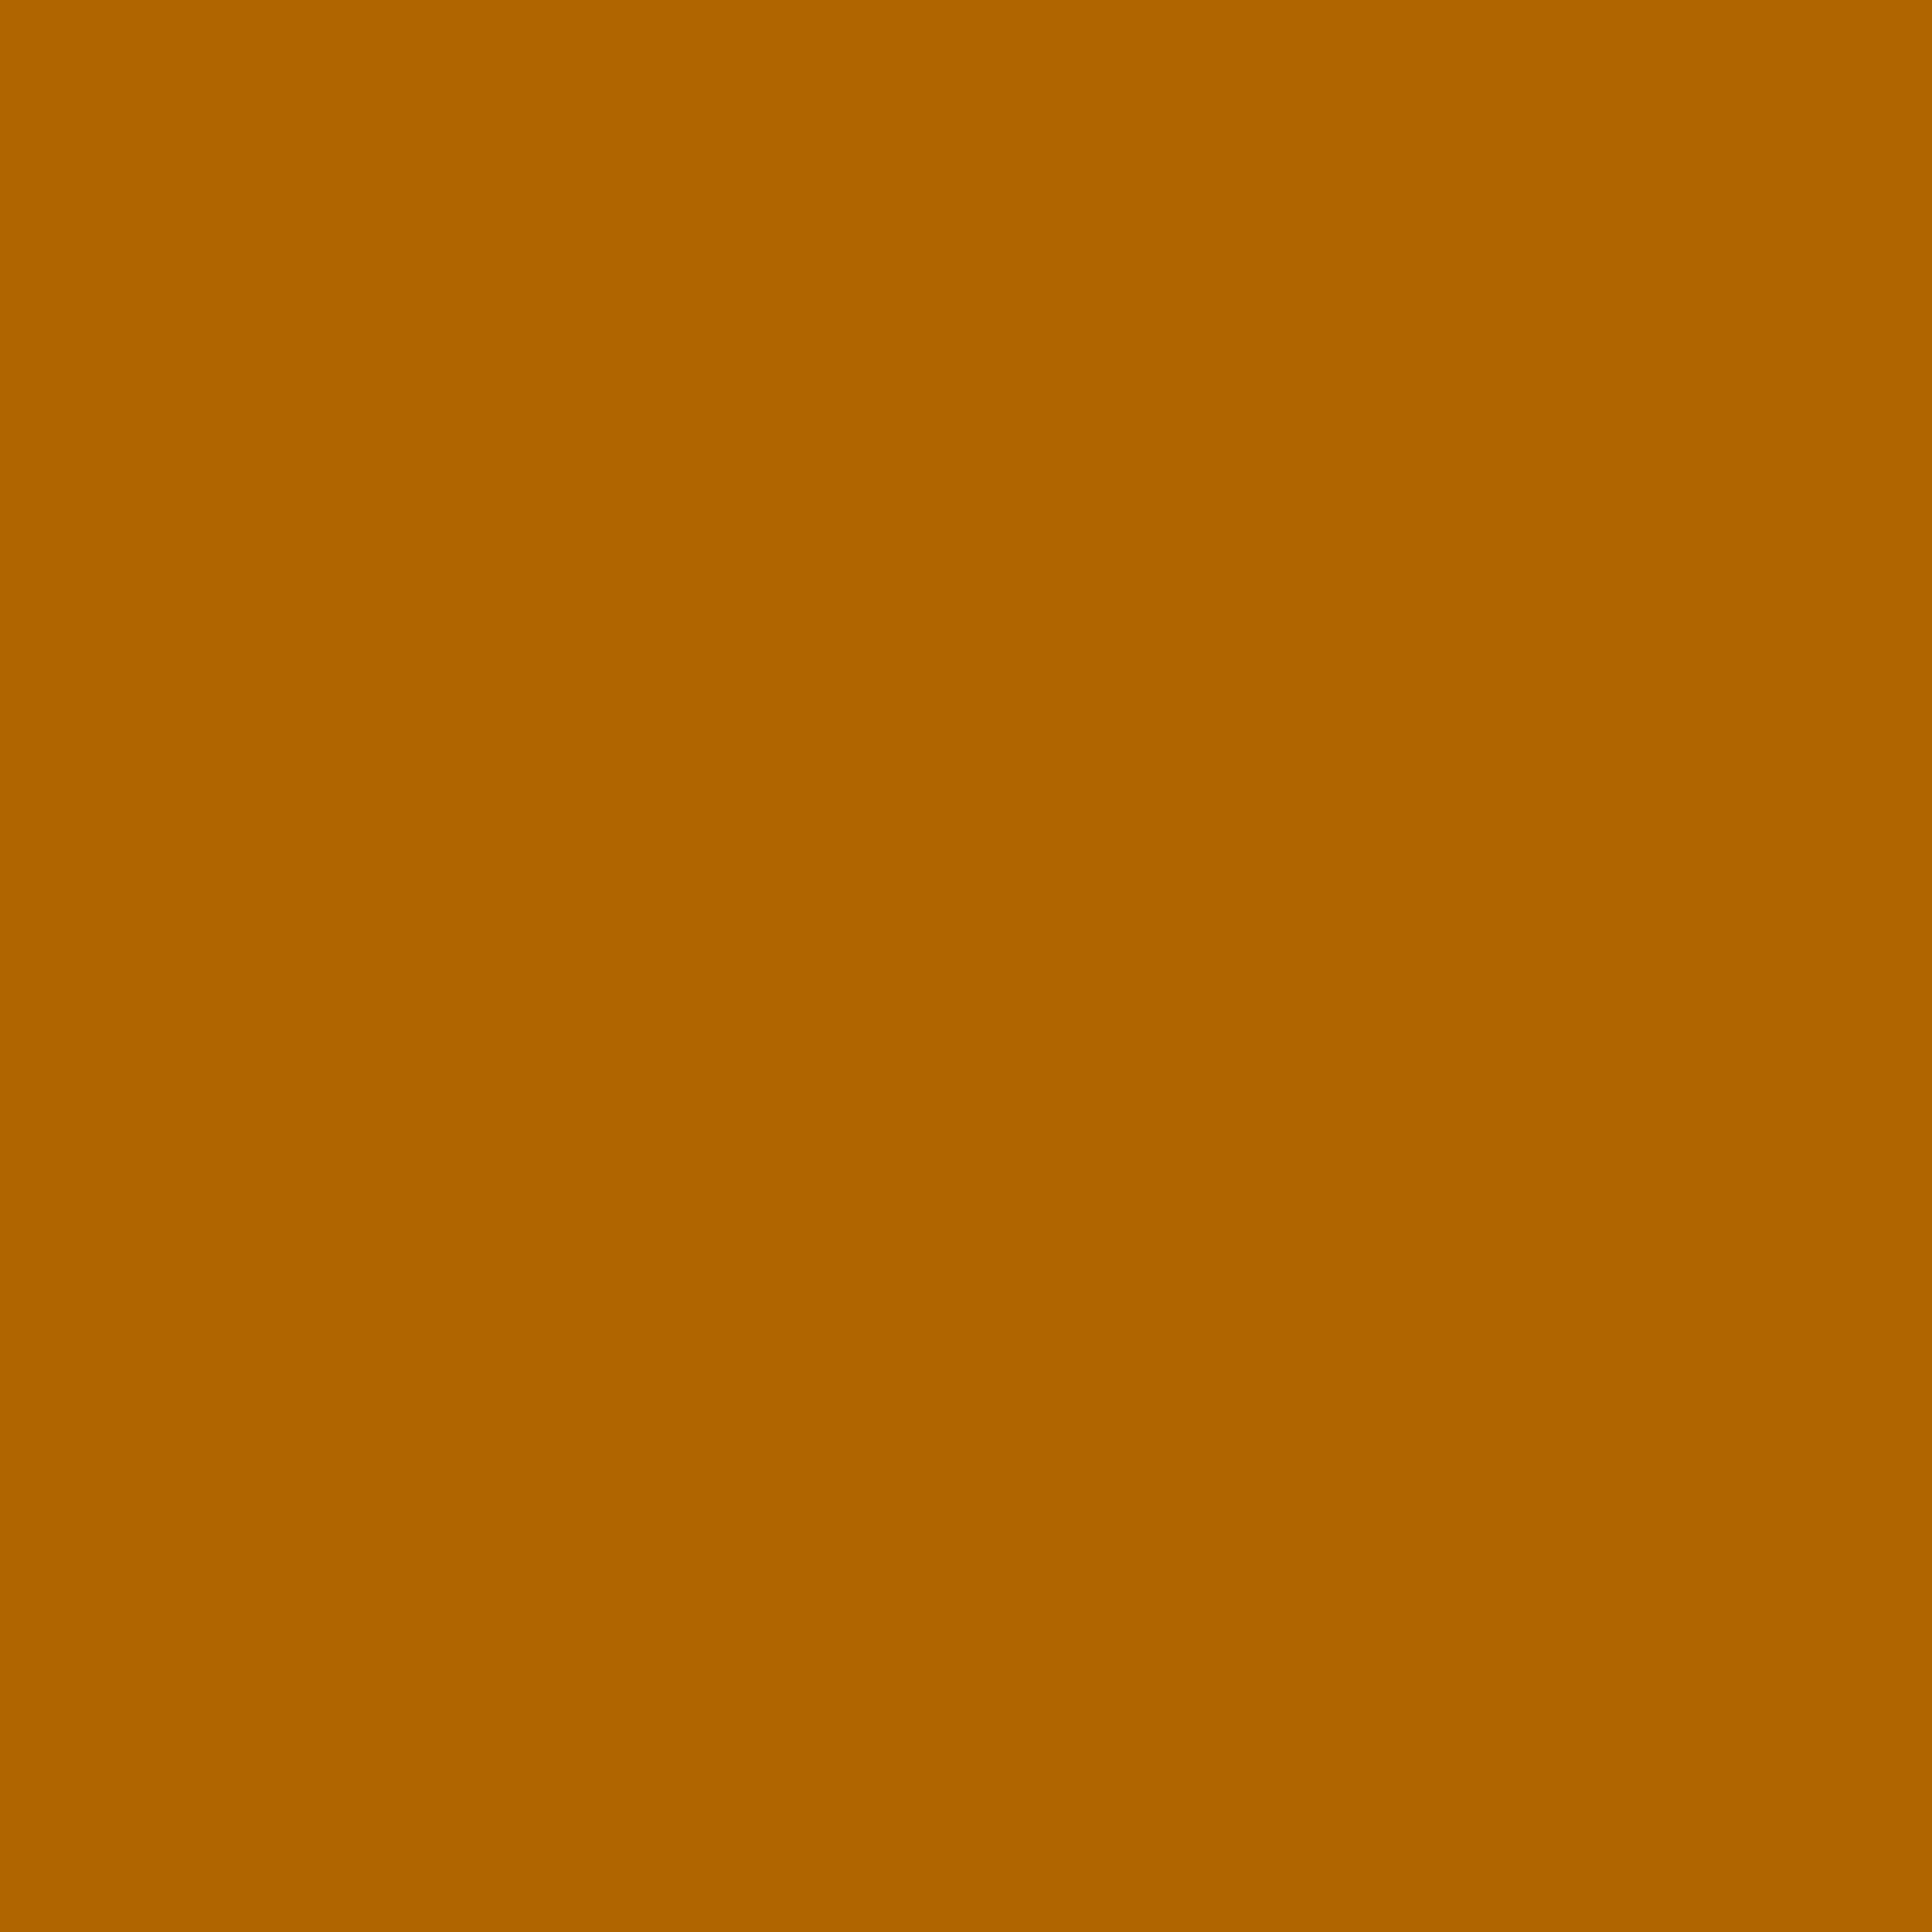 2048x2048 Ginger Solid Color Background